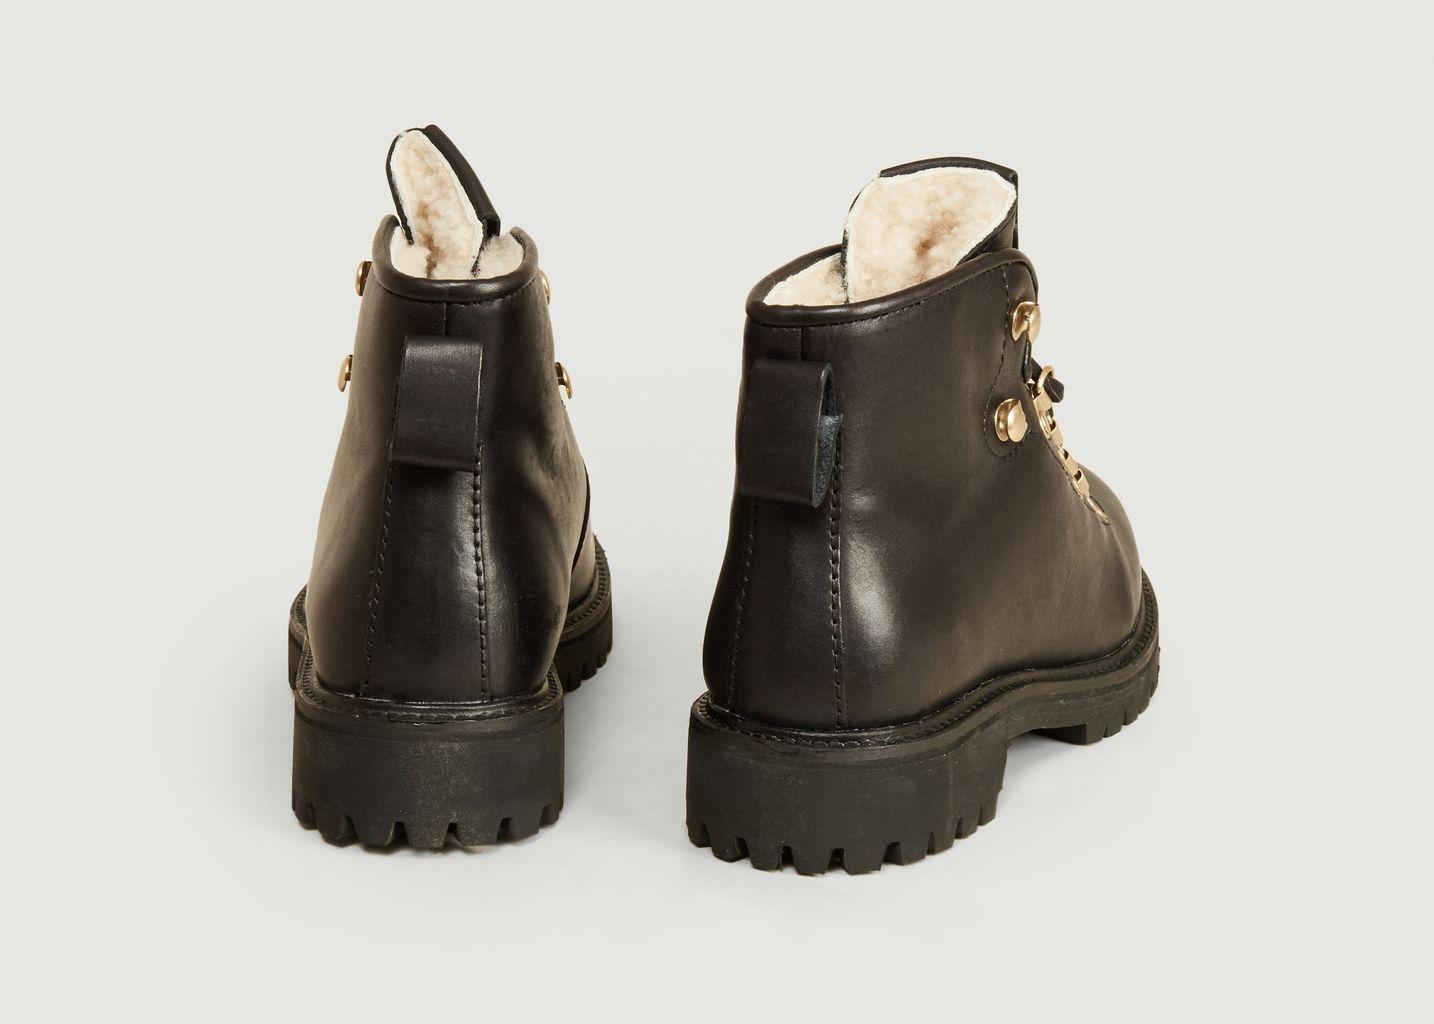 Bottines SL81 en cuir  - Blackstone